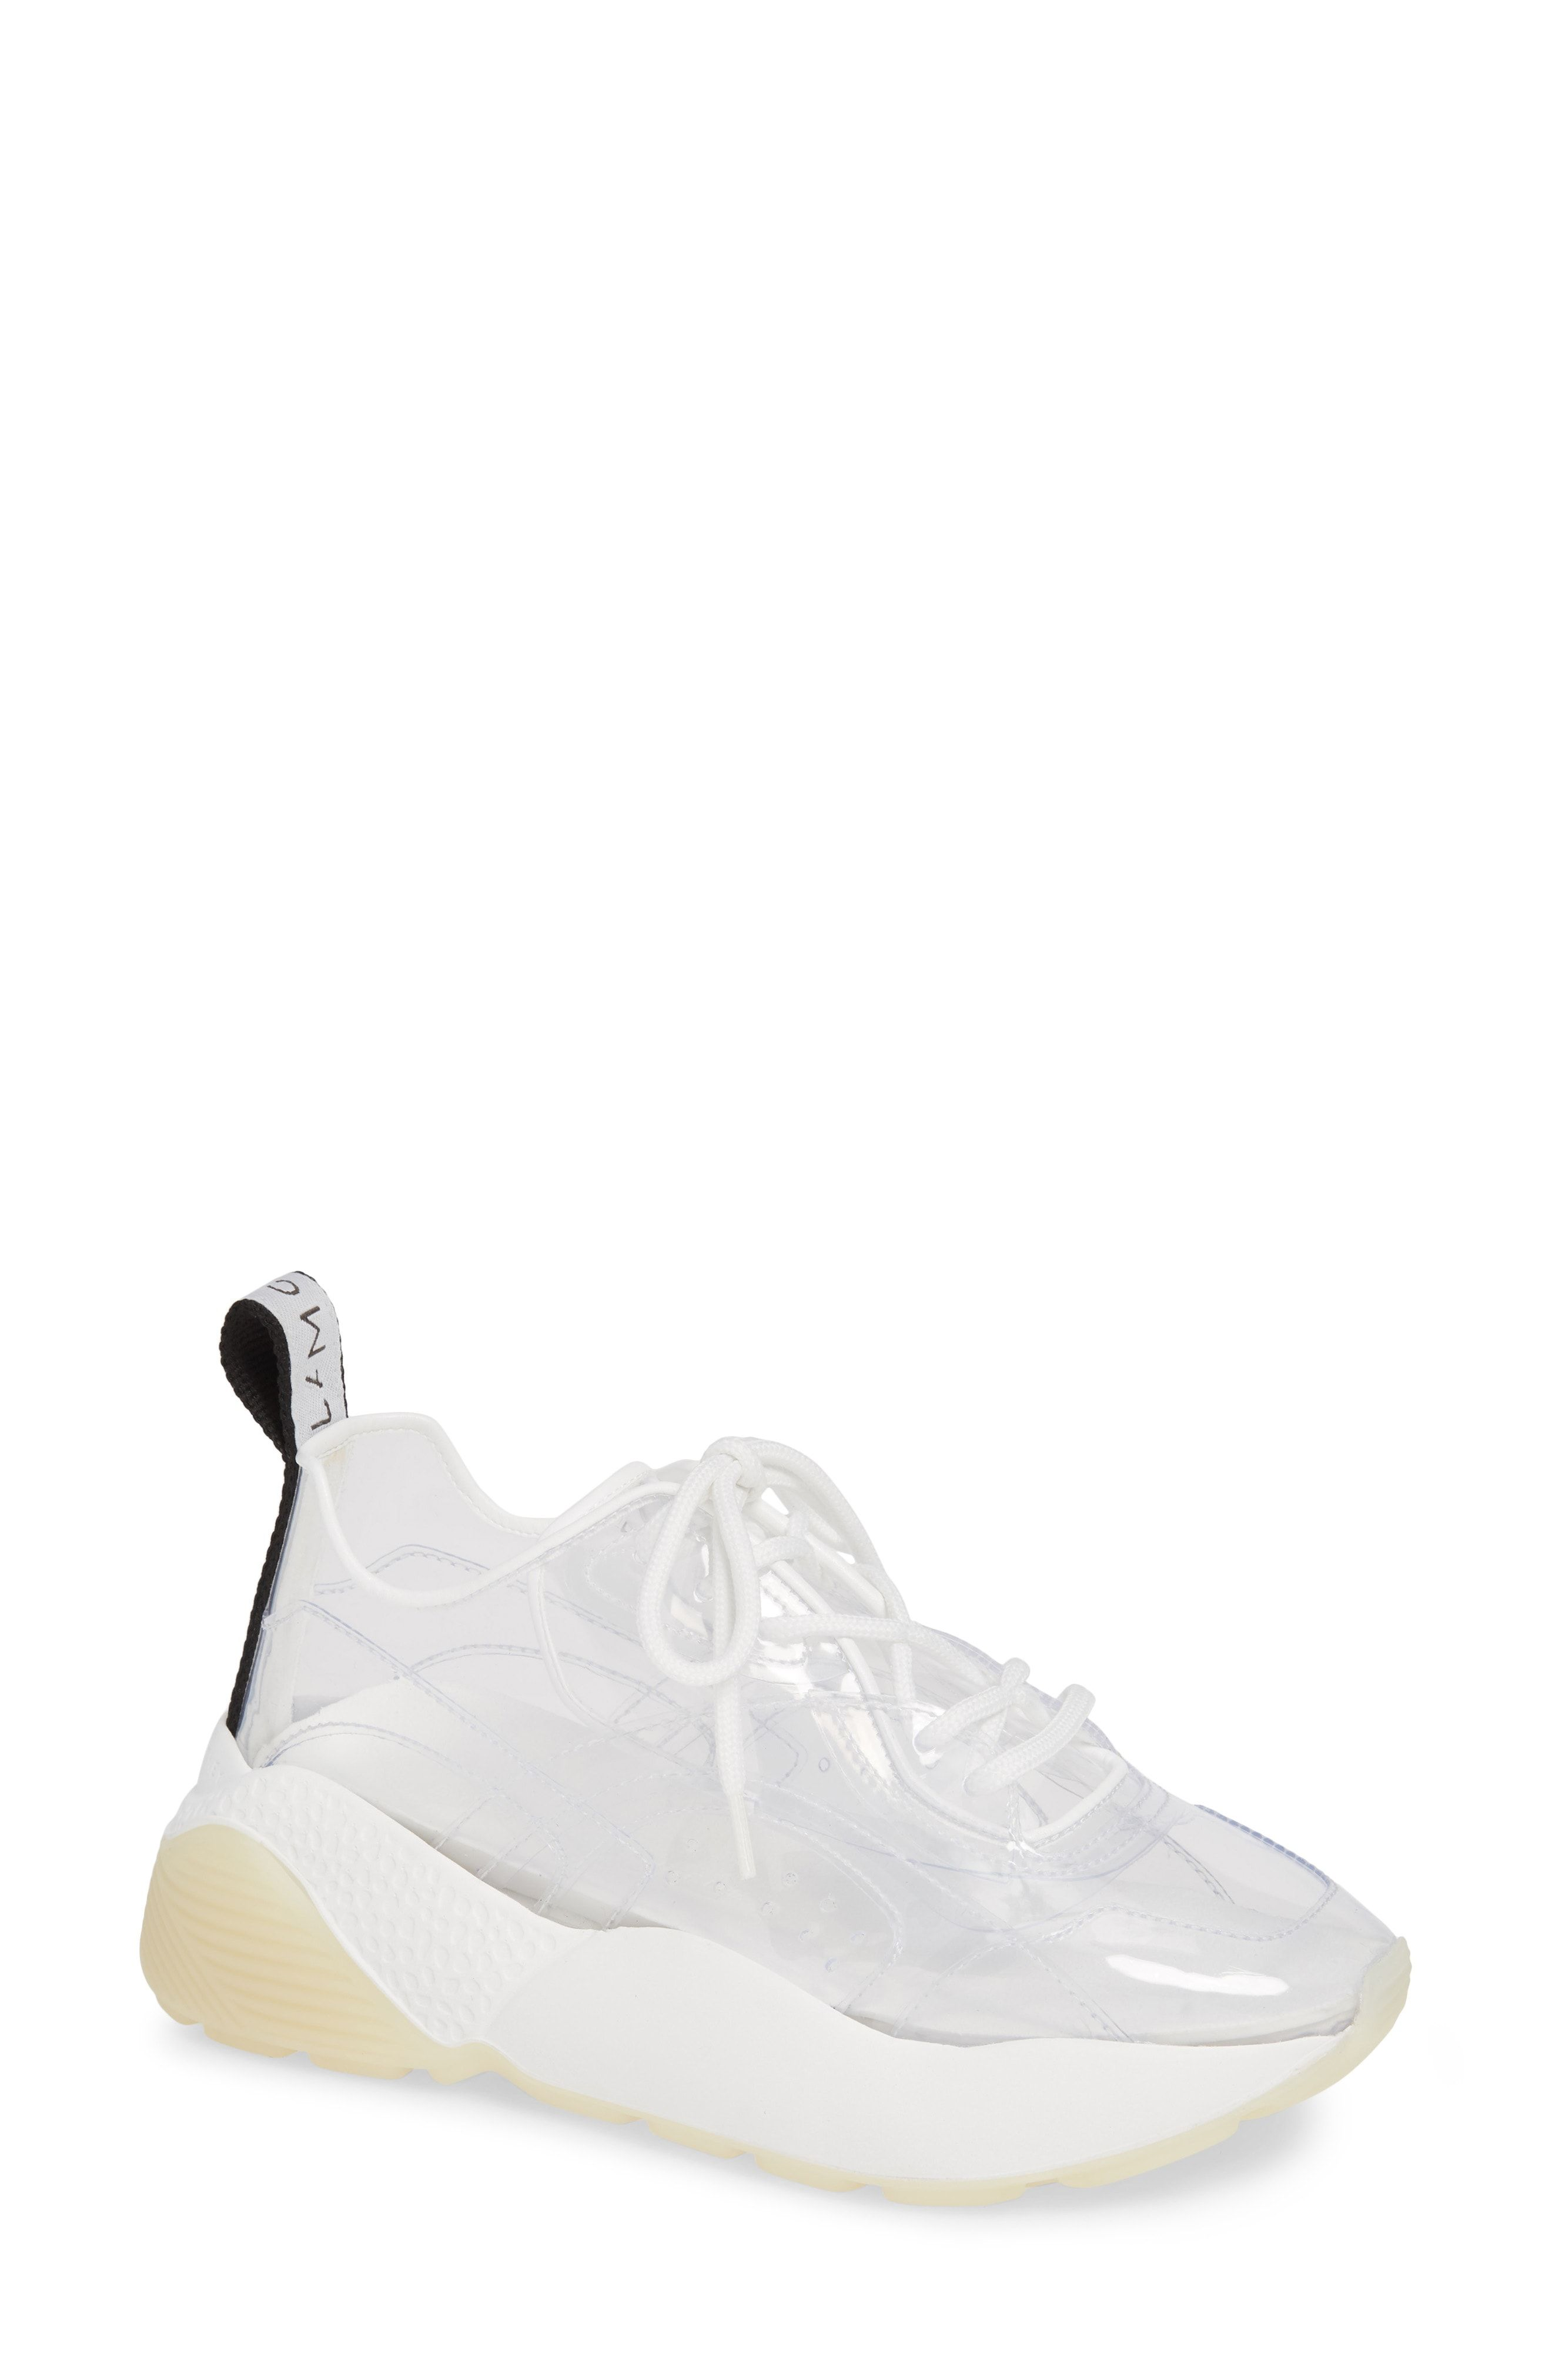 a6ee801a0 STELLA MCCARTNEY ECLYPSE TRANSPARENT SNEAKER.  stellamccartney  shoes